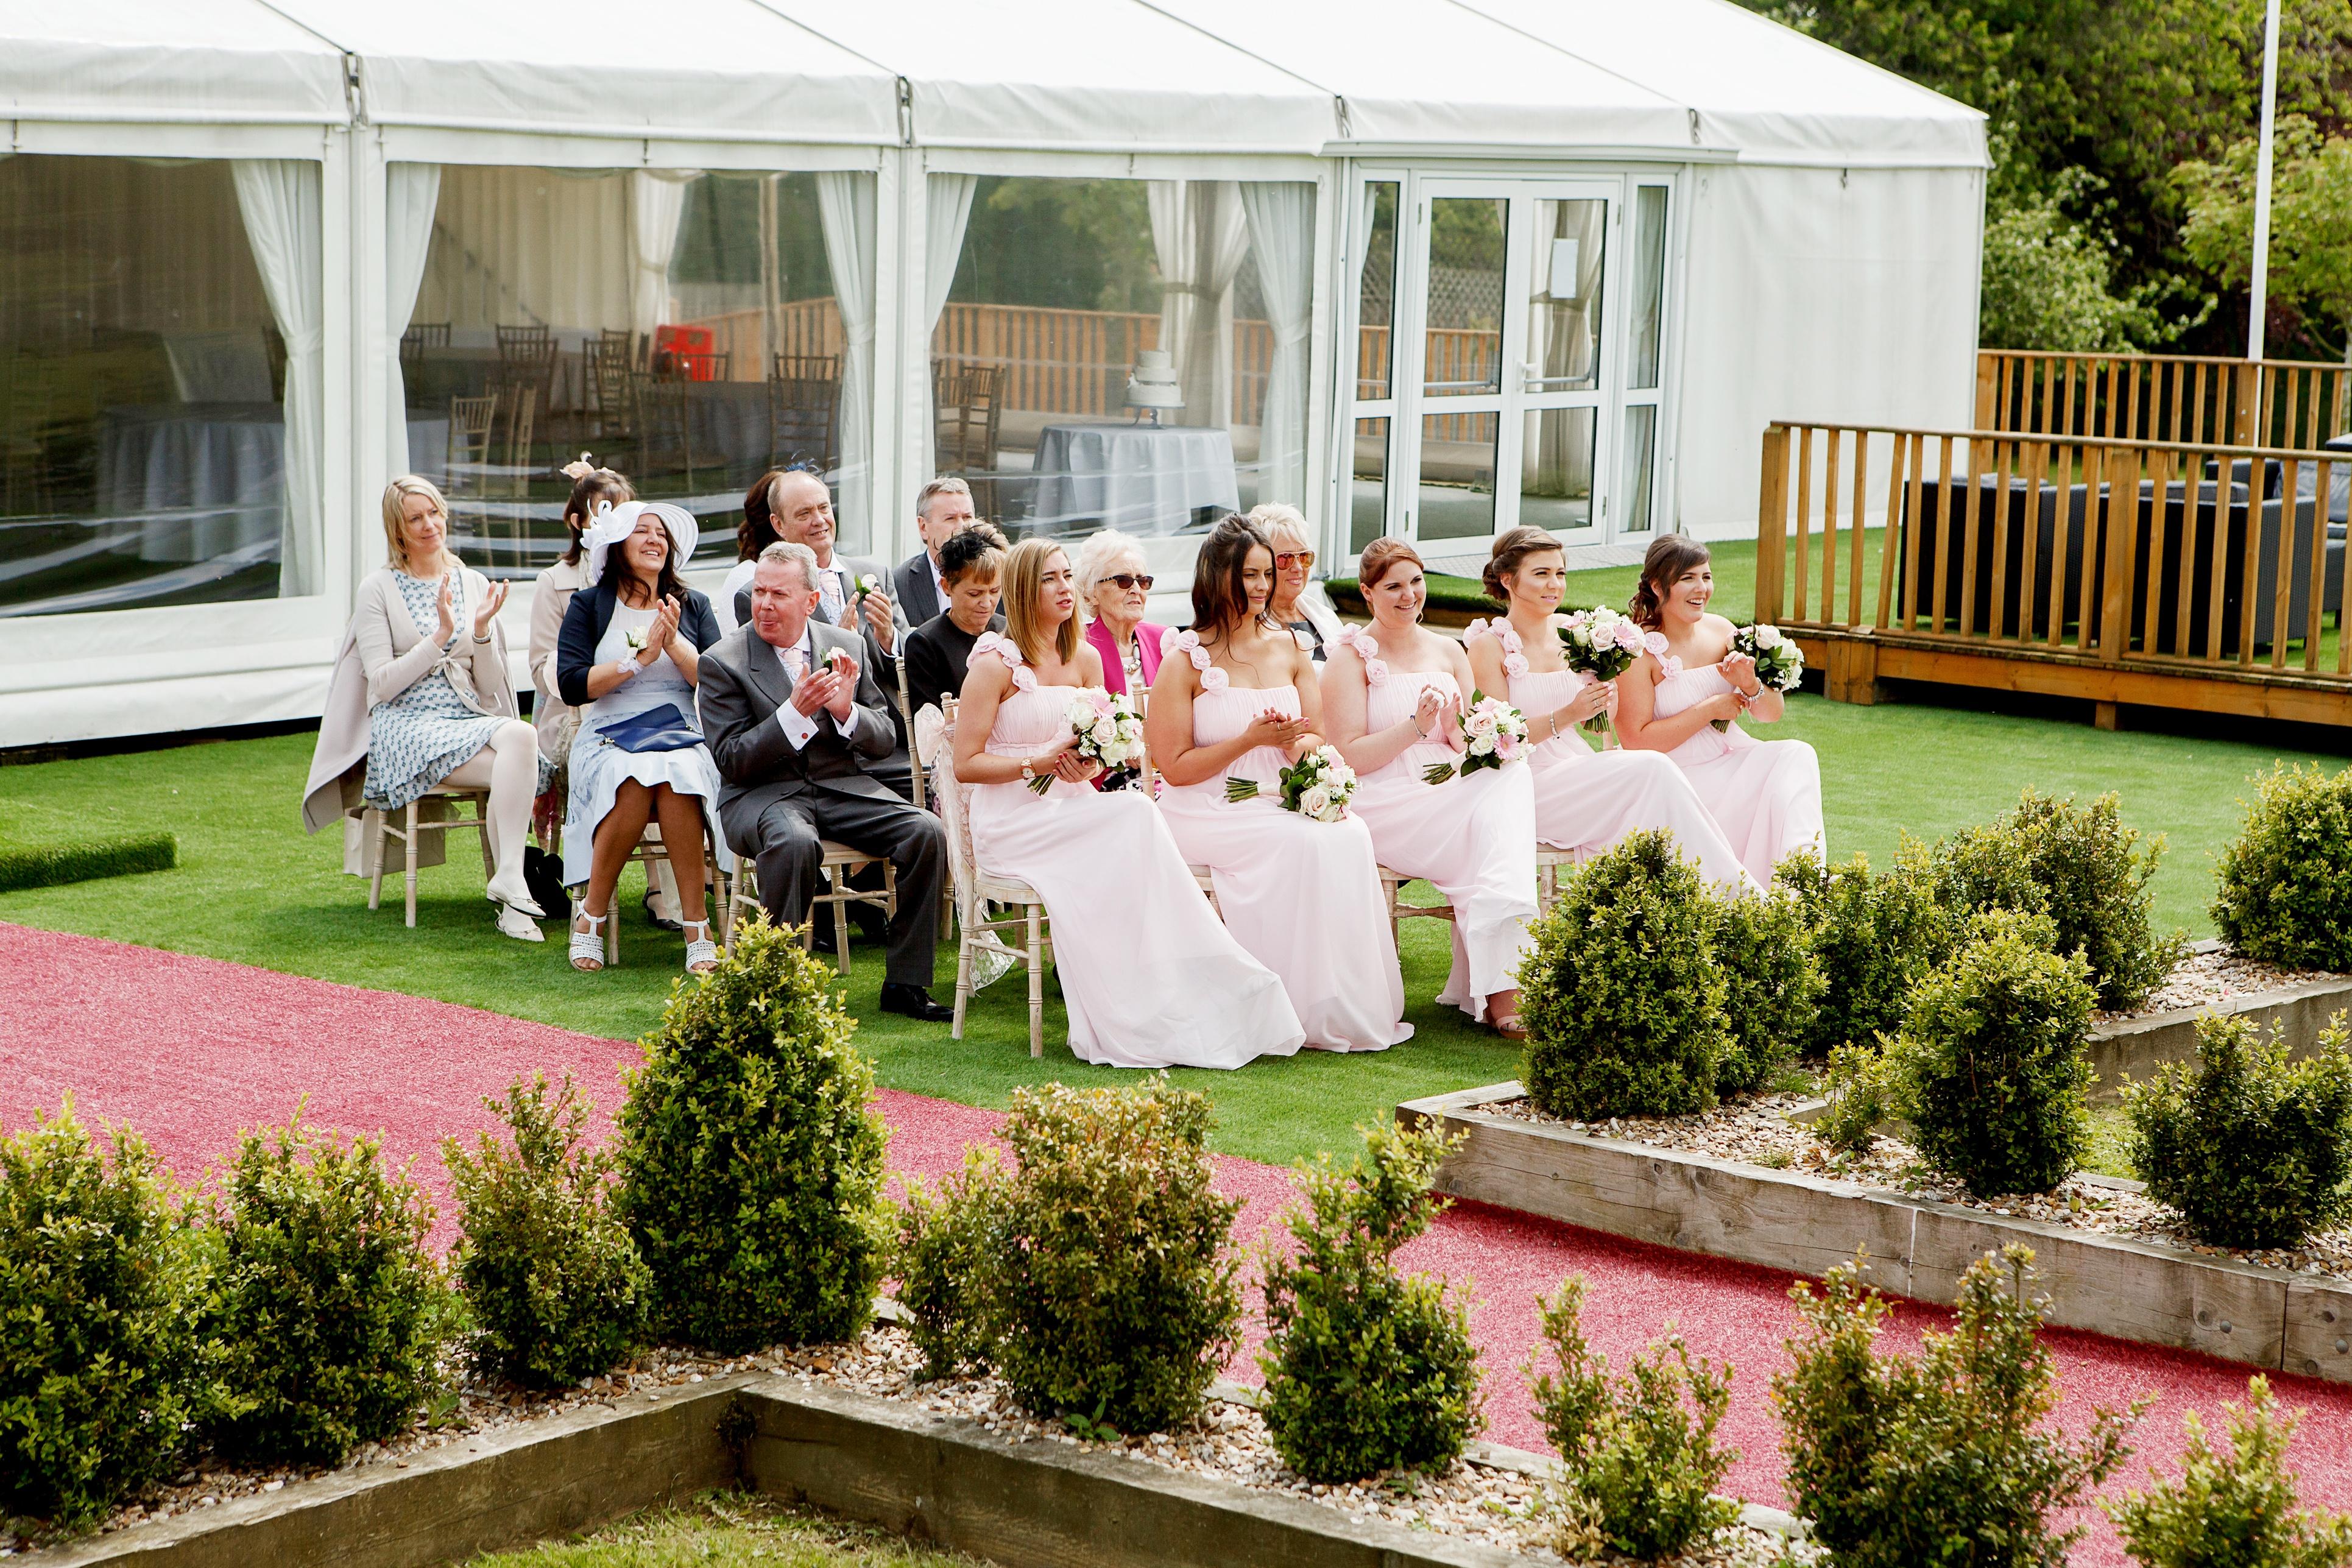 Shattle-Hall-wedding-photographer-RD-Elen-Studio-Photography-249